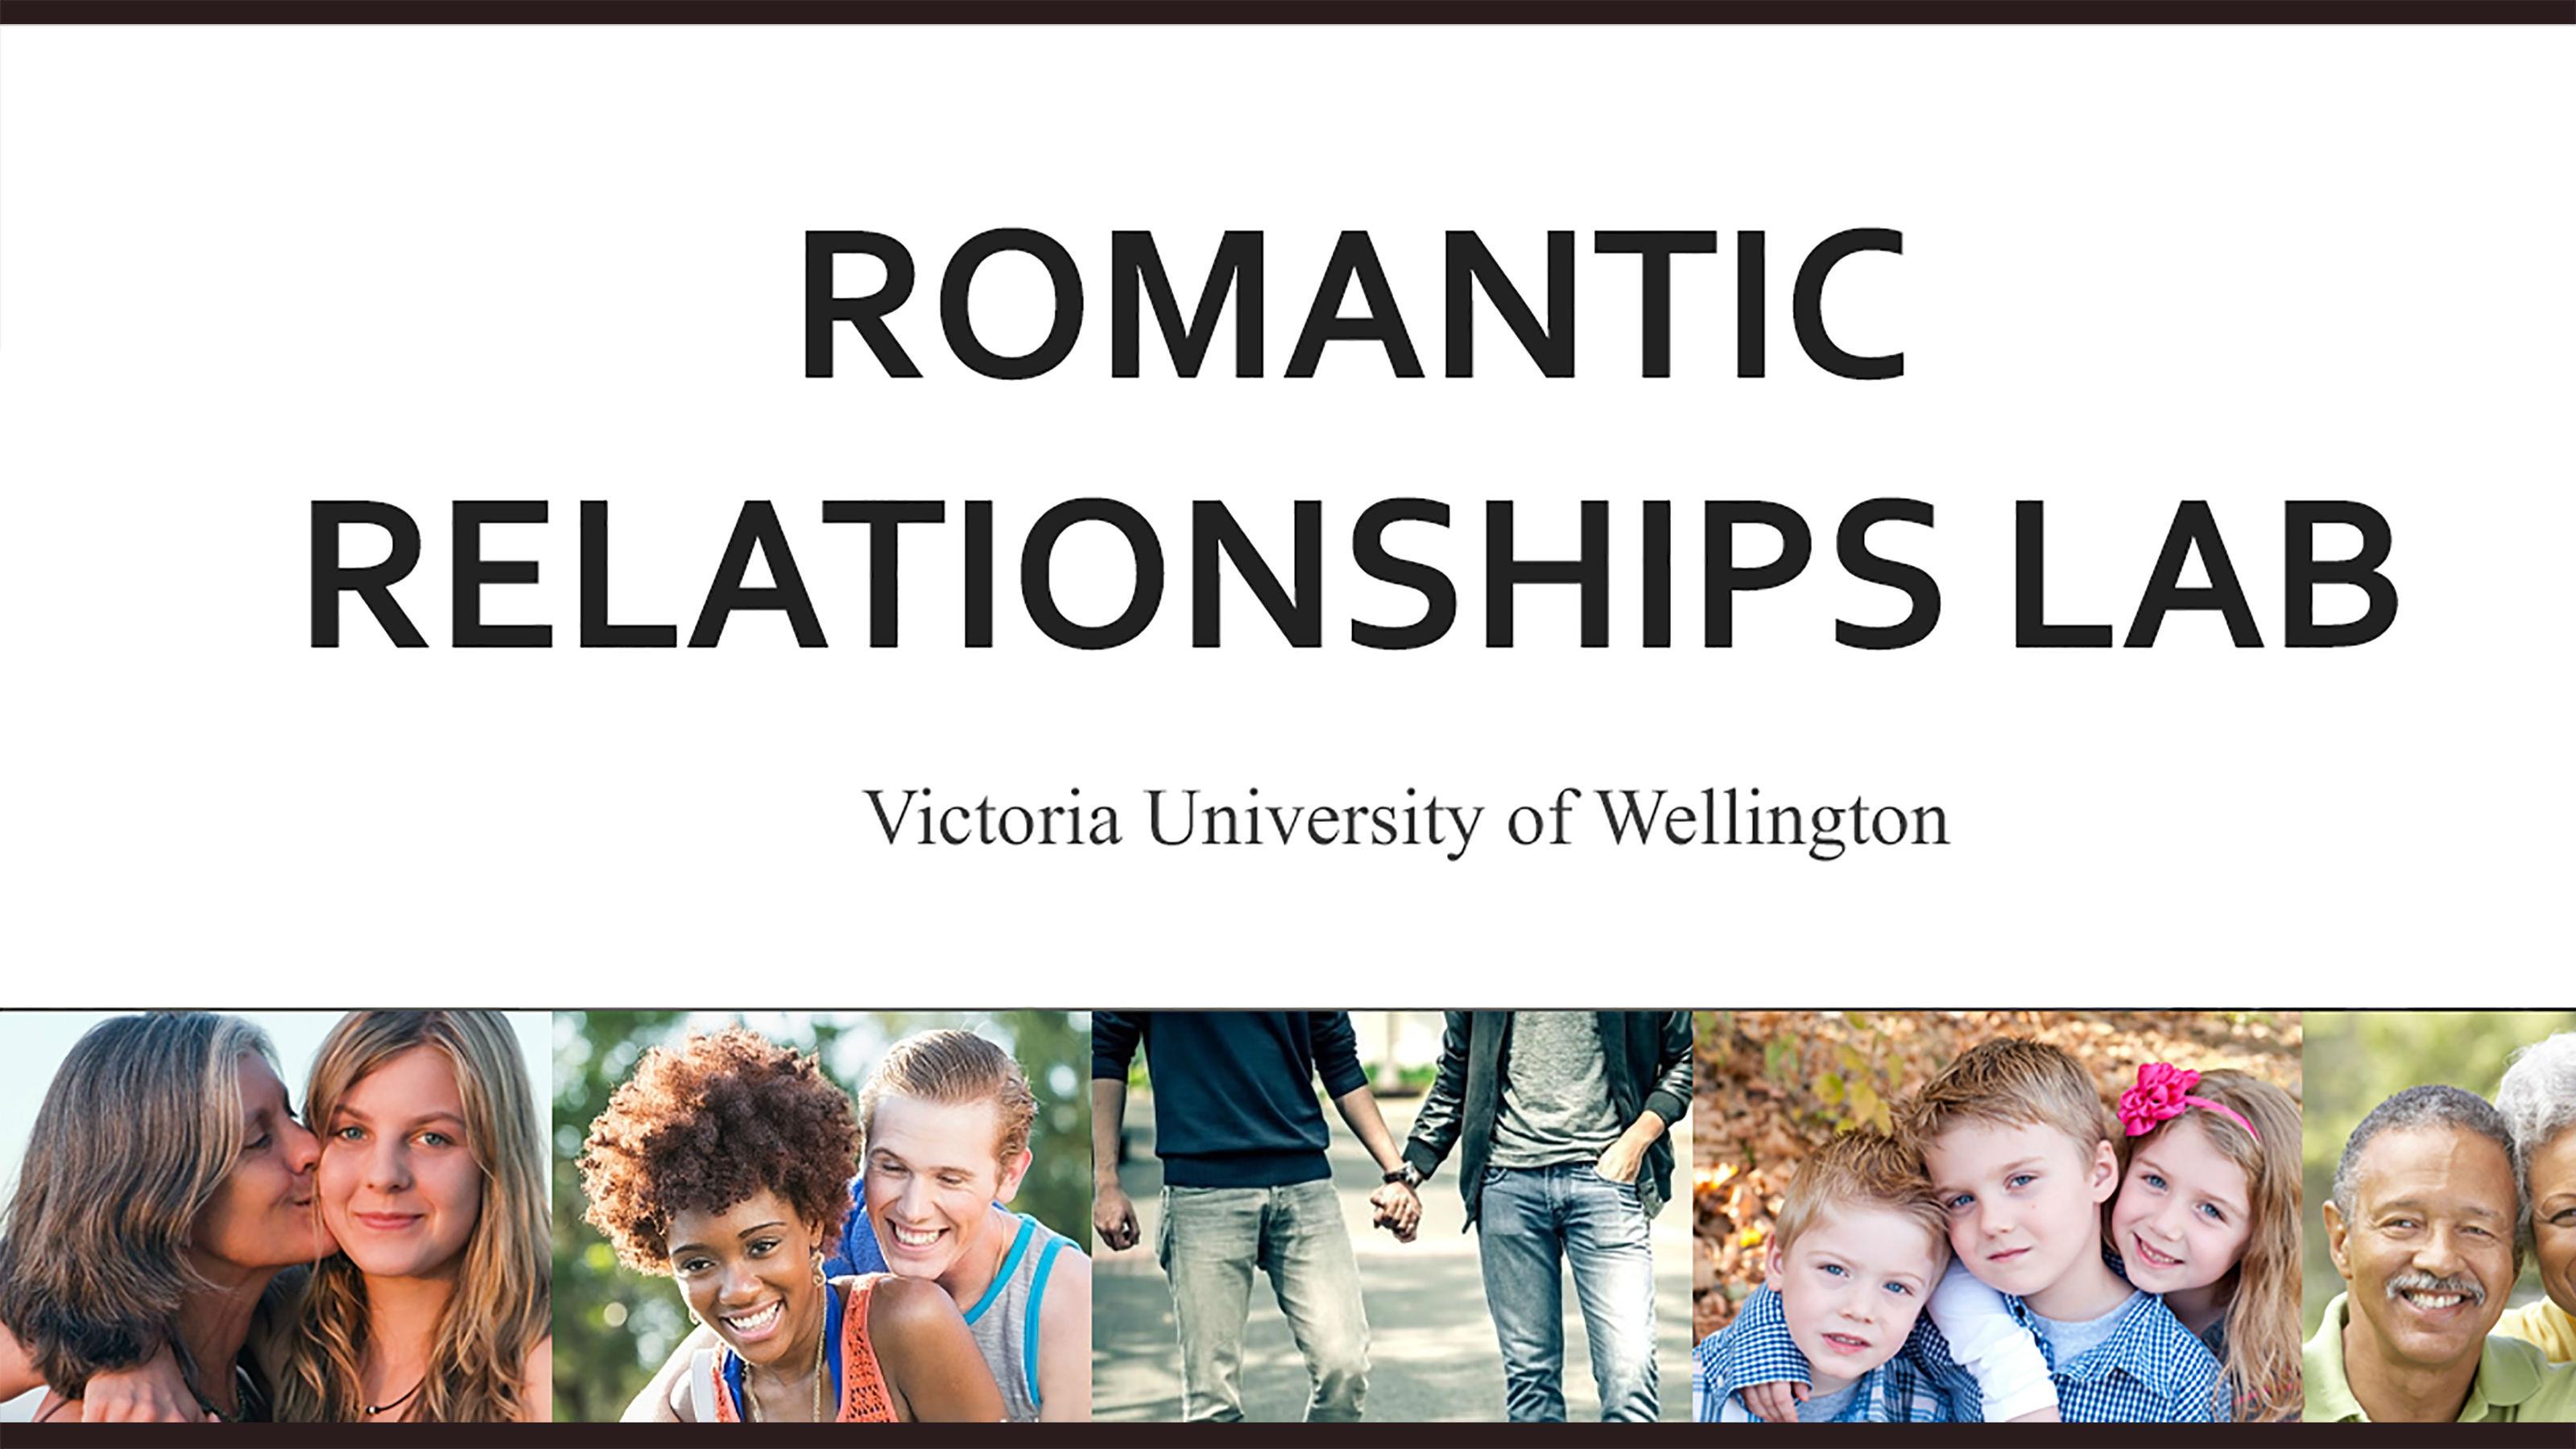 Romantic relationships lab